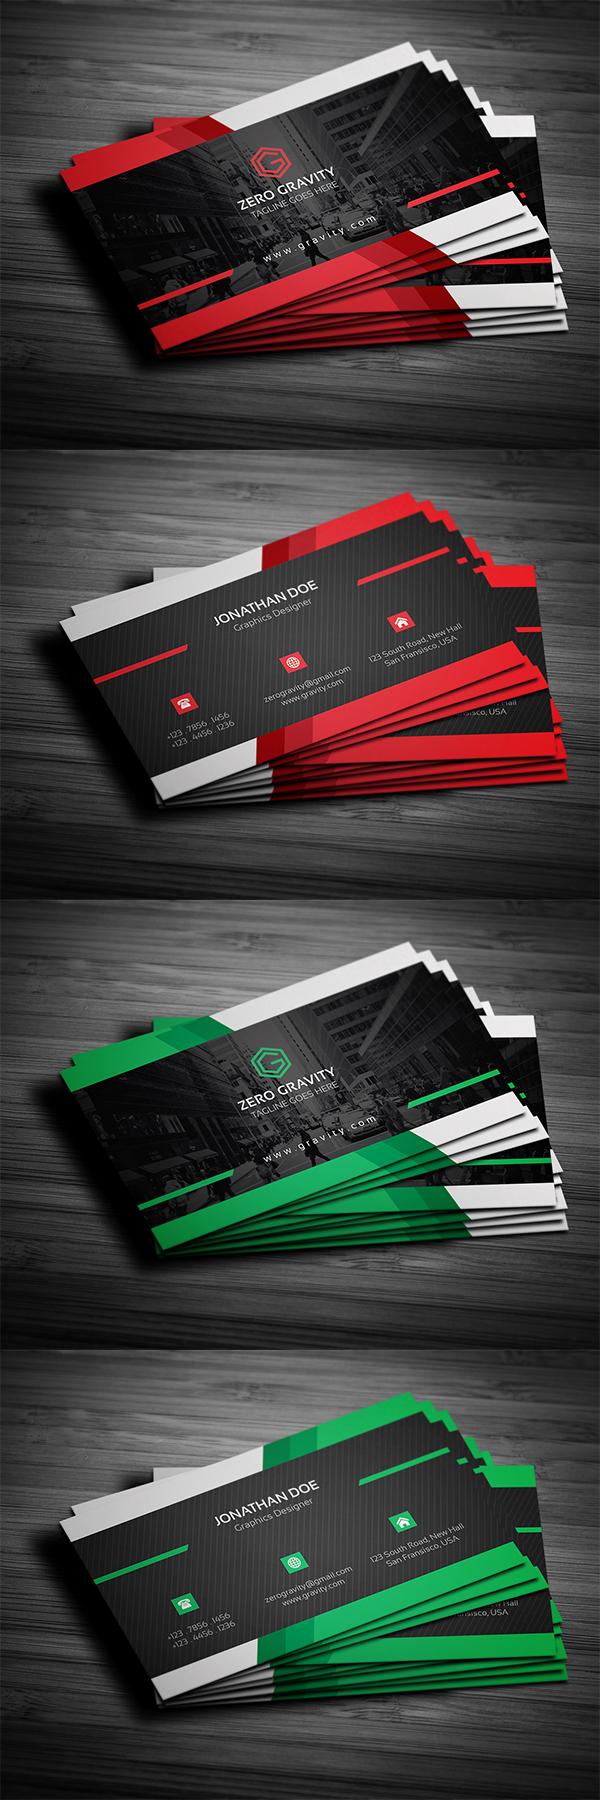 04 Business Card Design